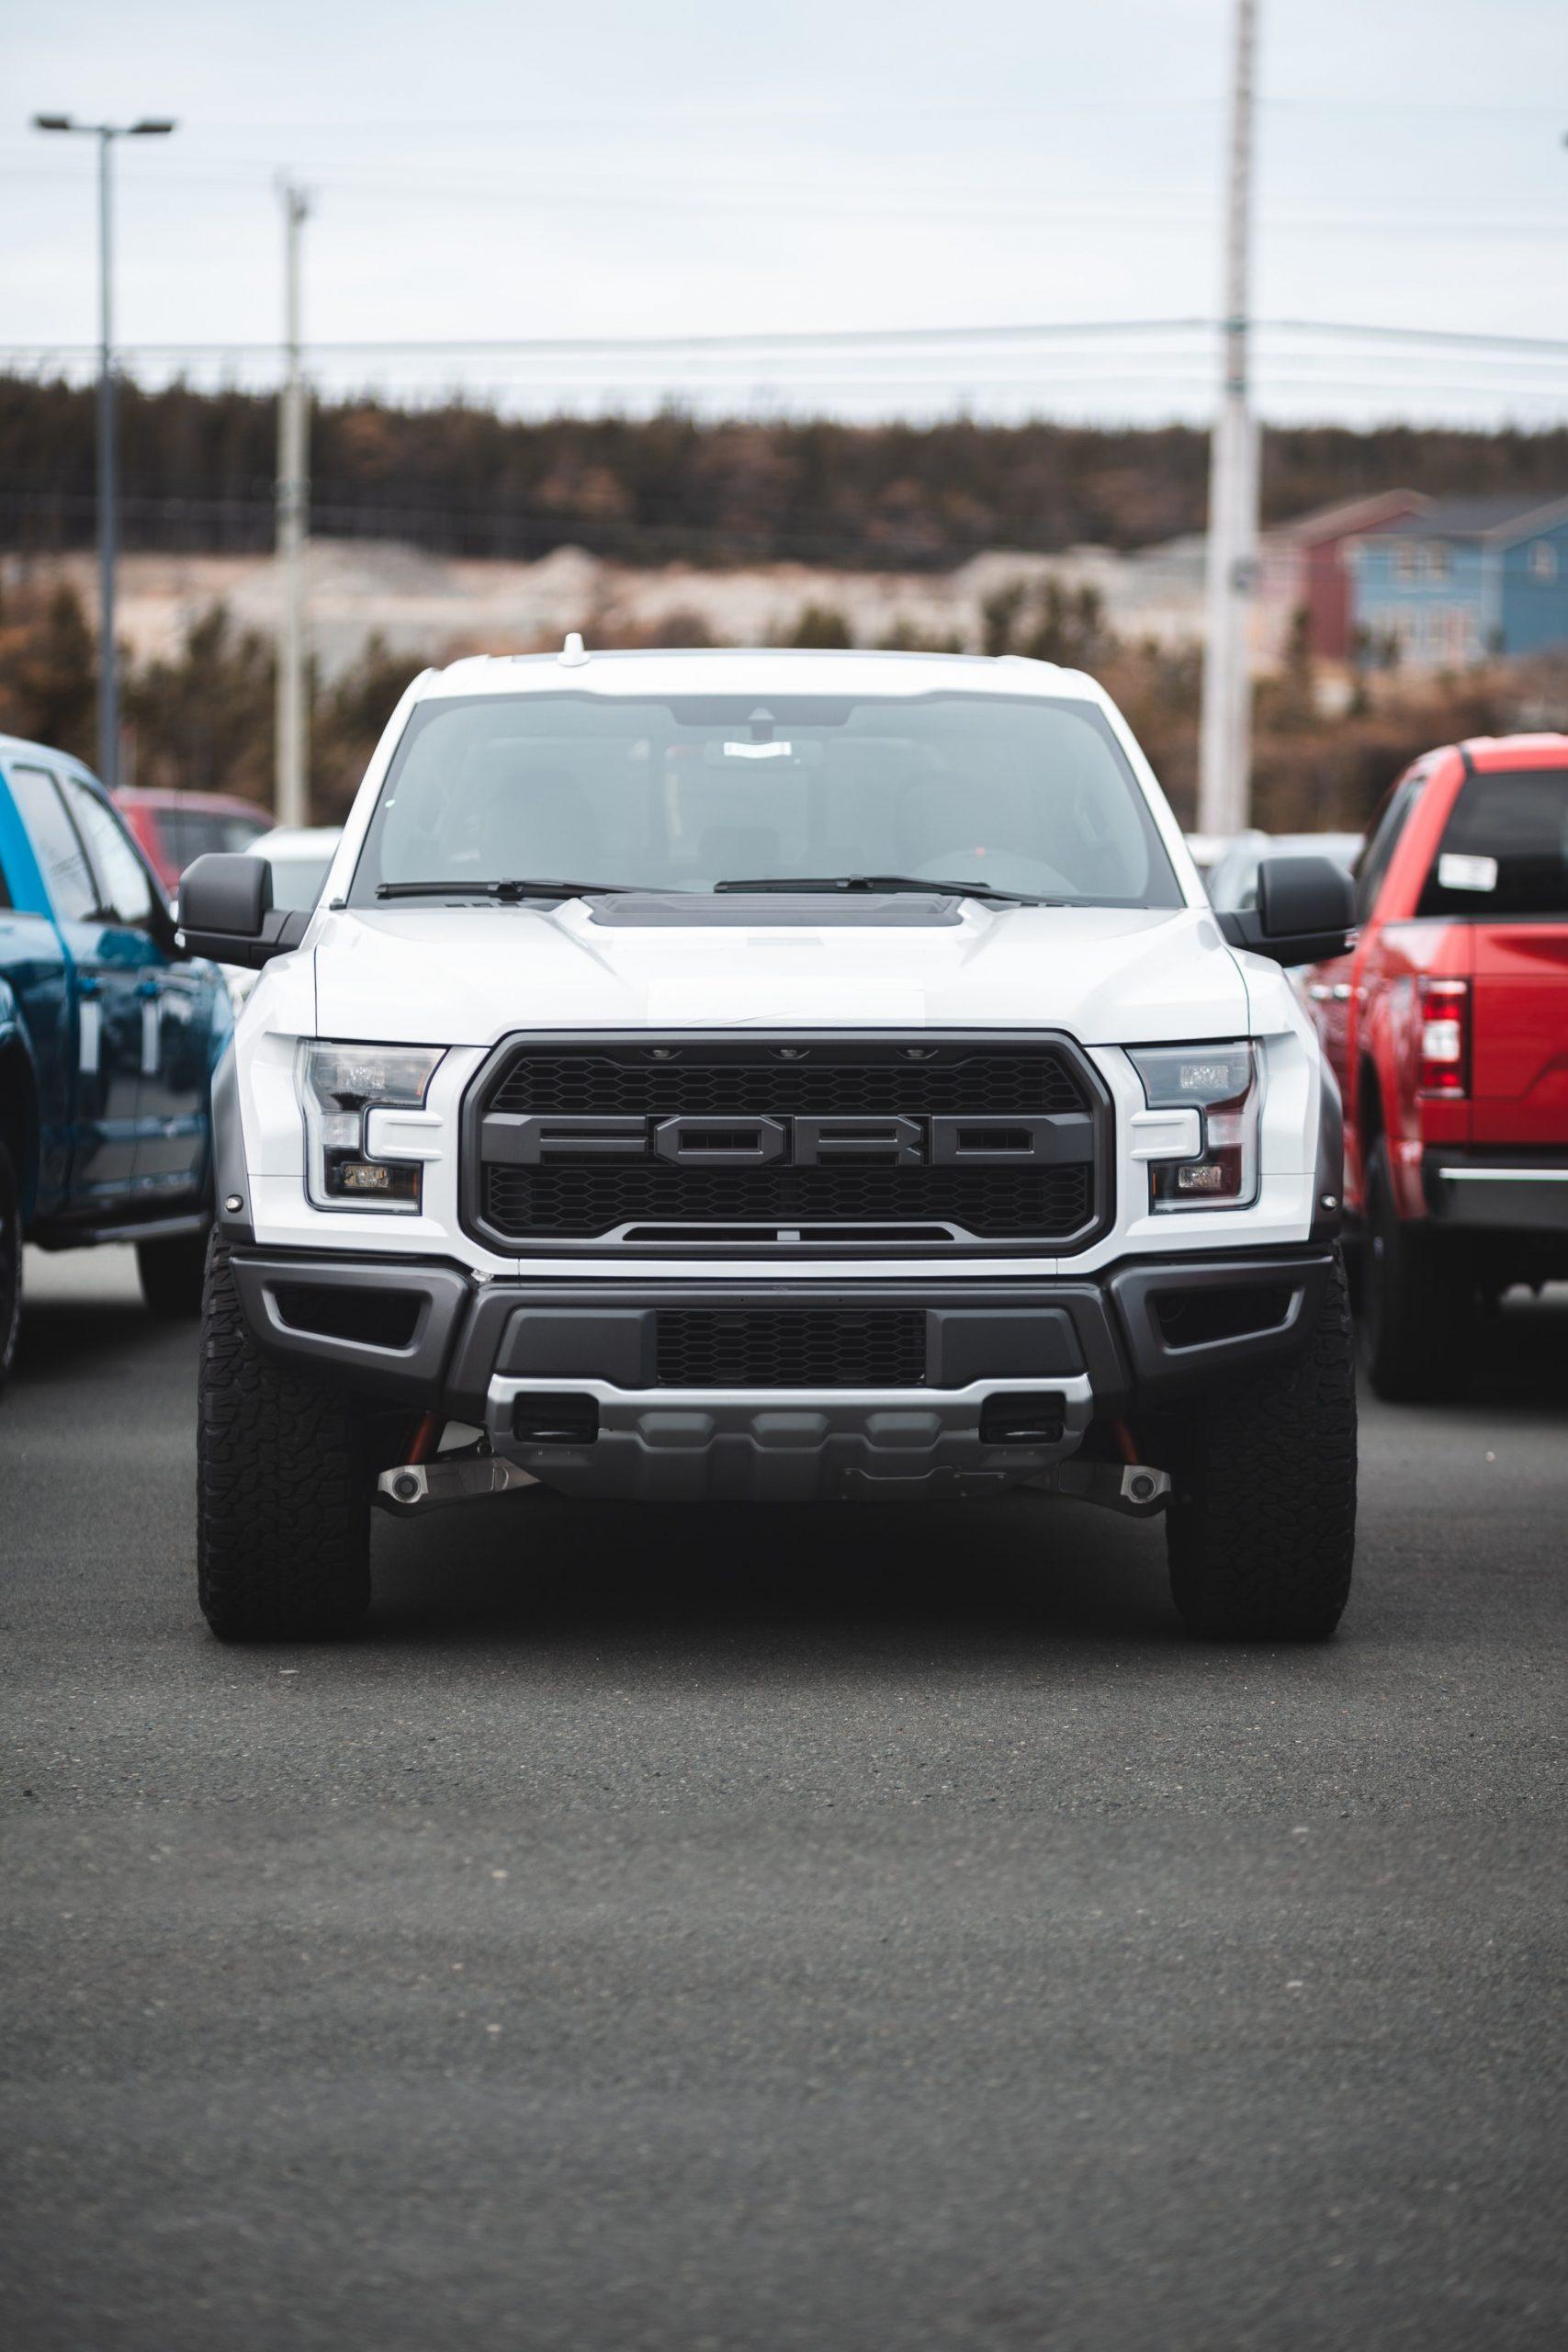 5 Best Ford Dealer in London